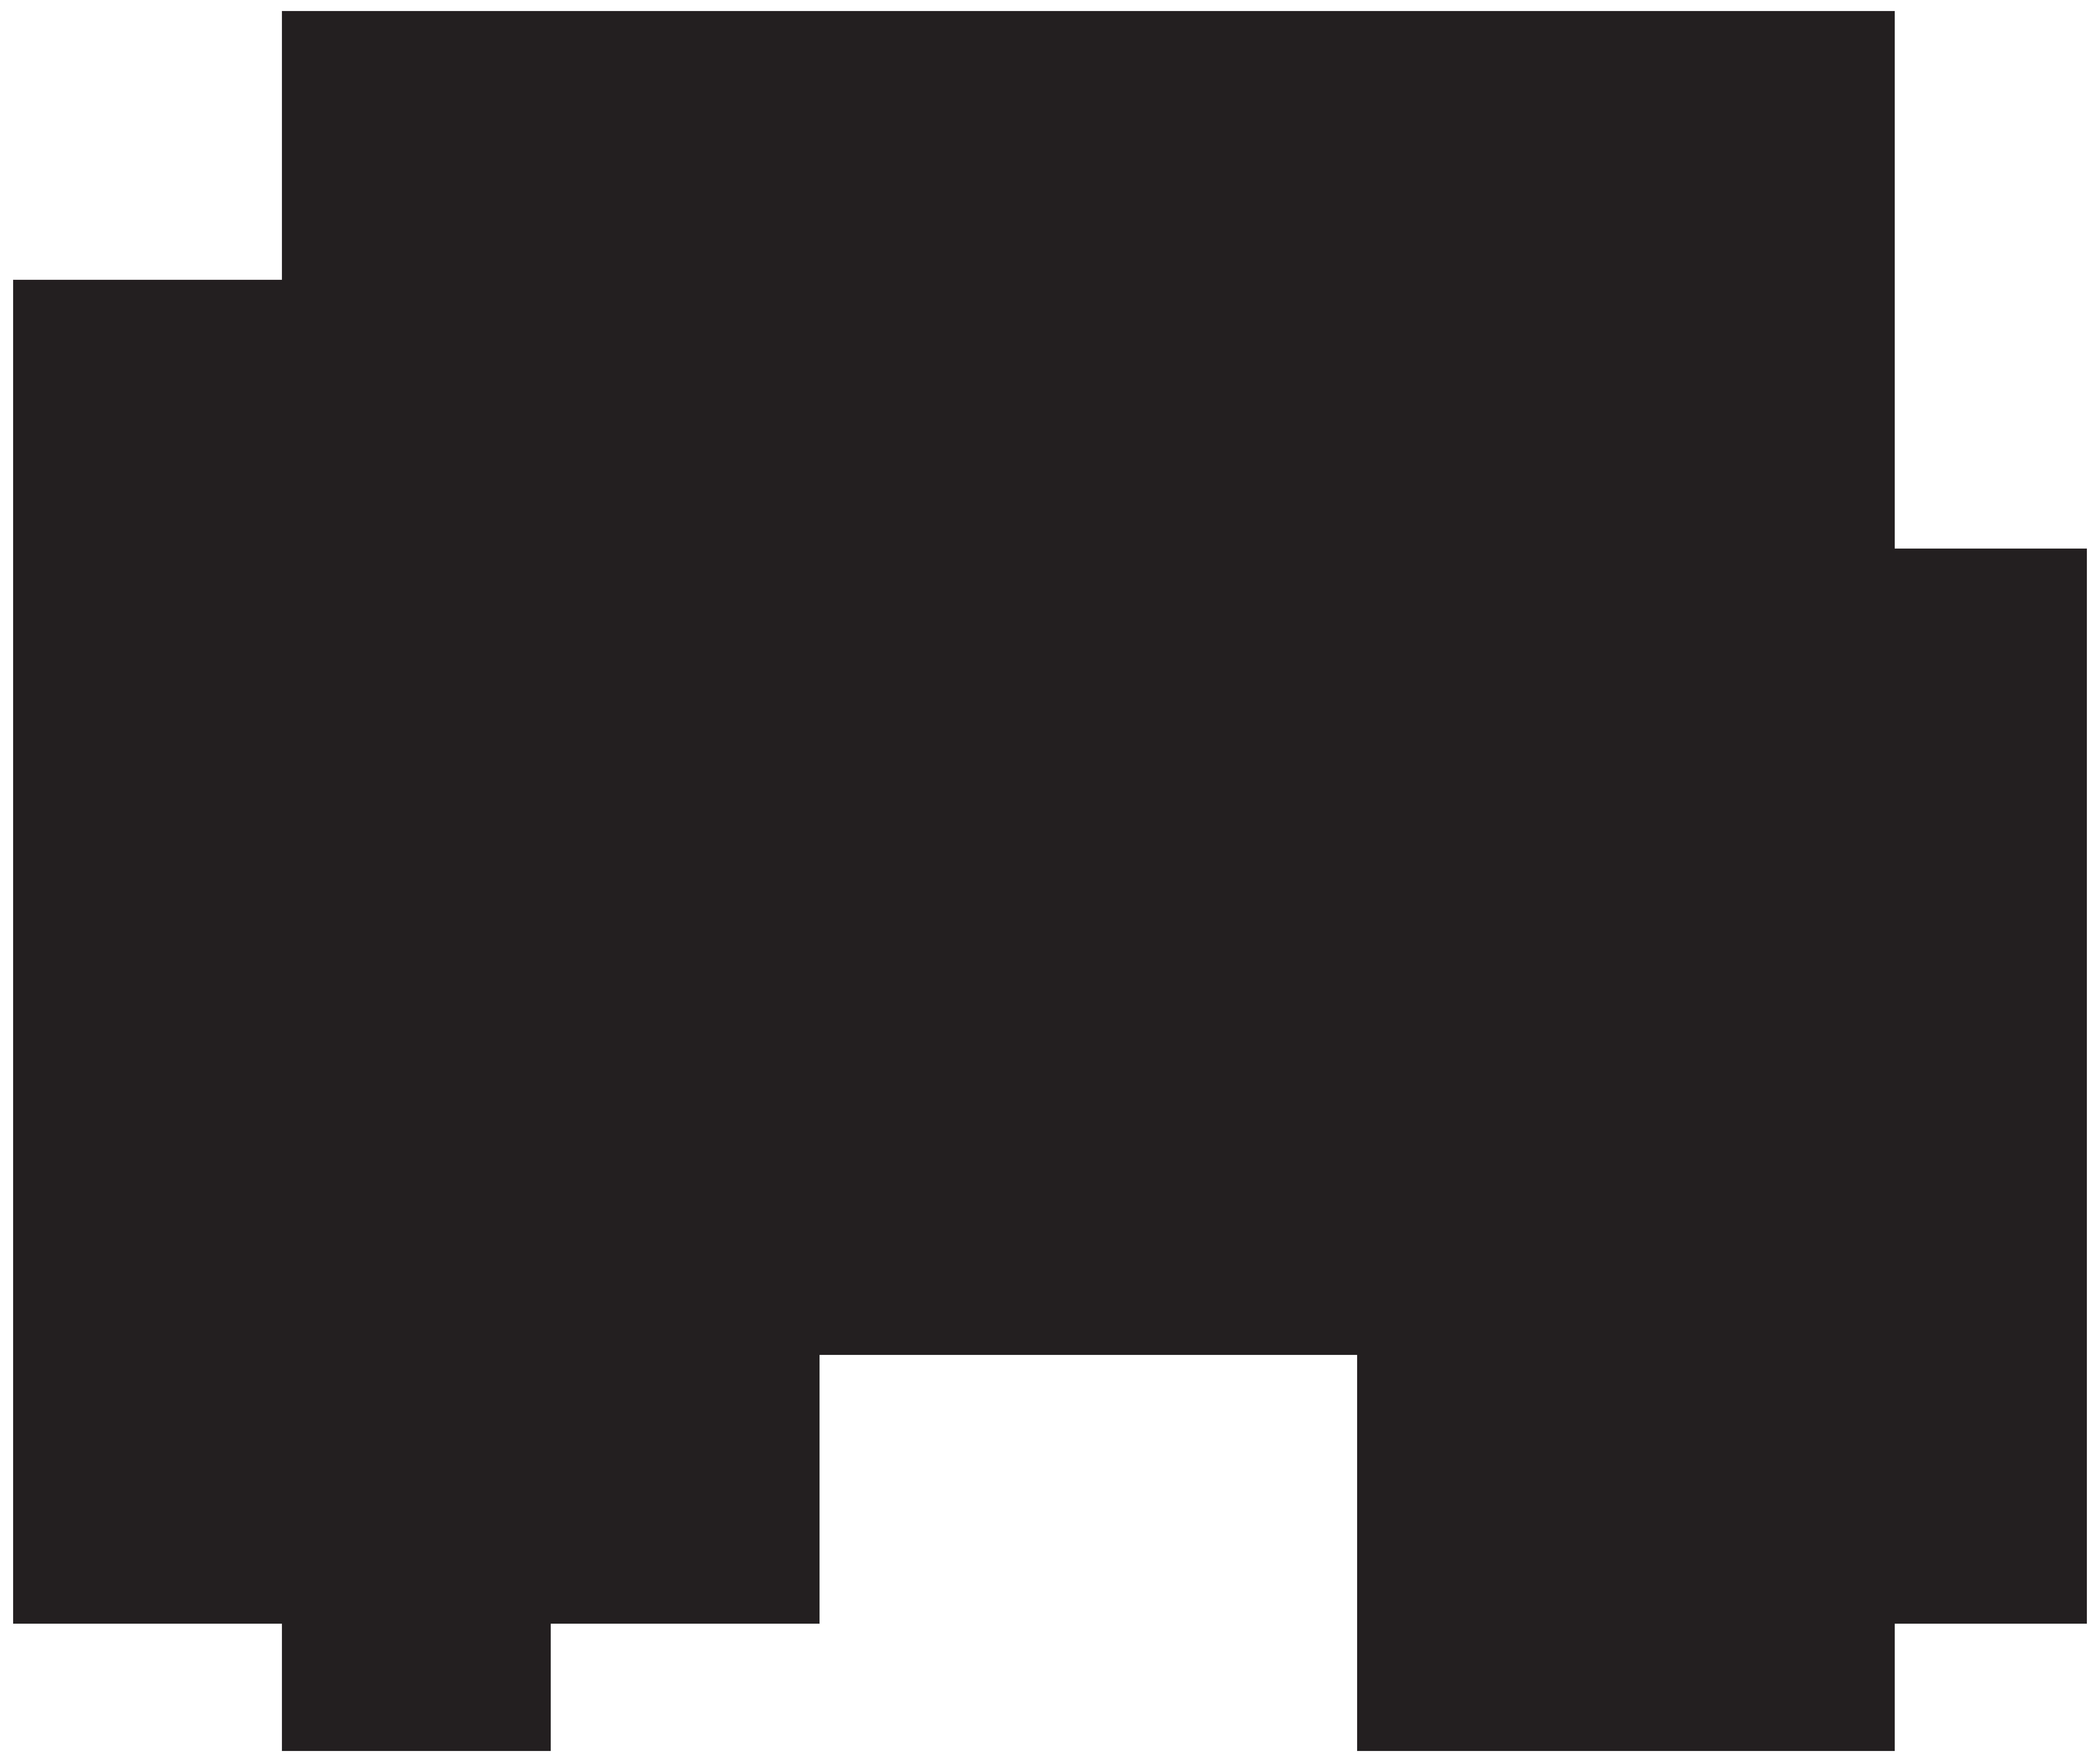 Silhouette png clip art. Crab clipart crab stick